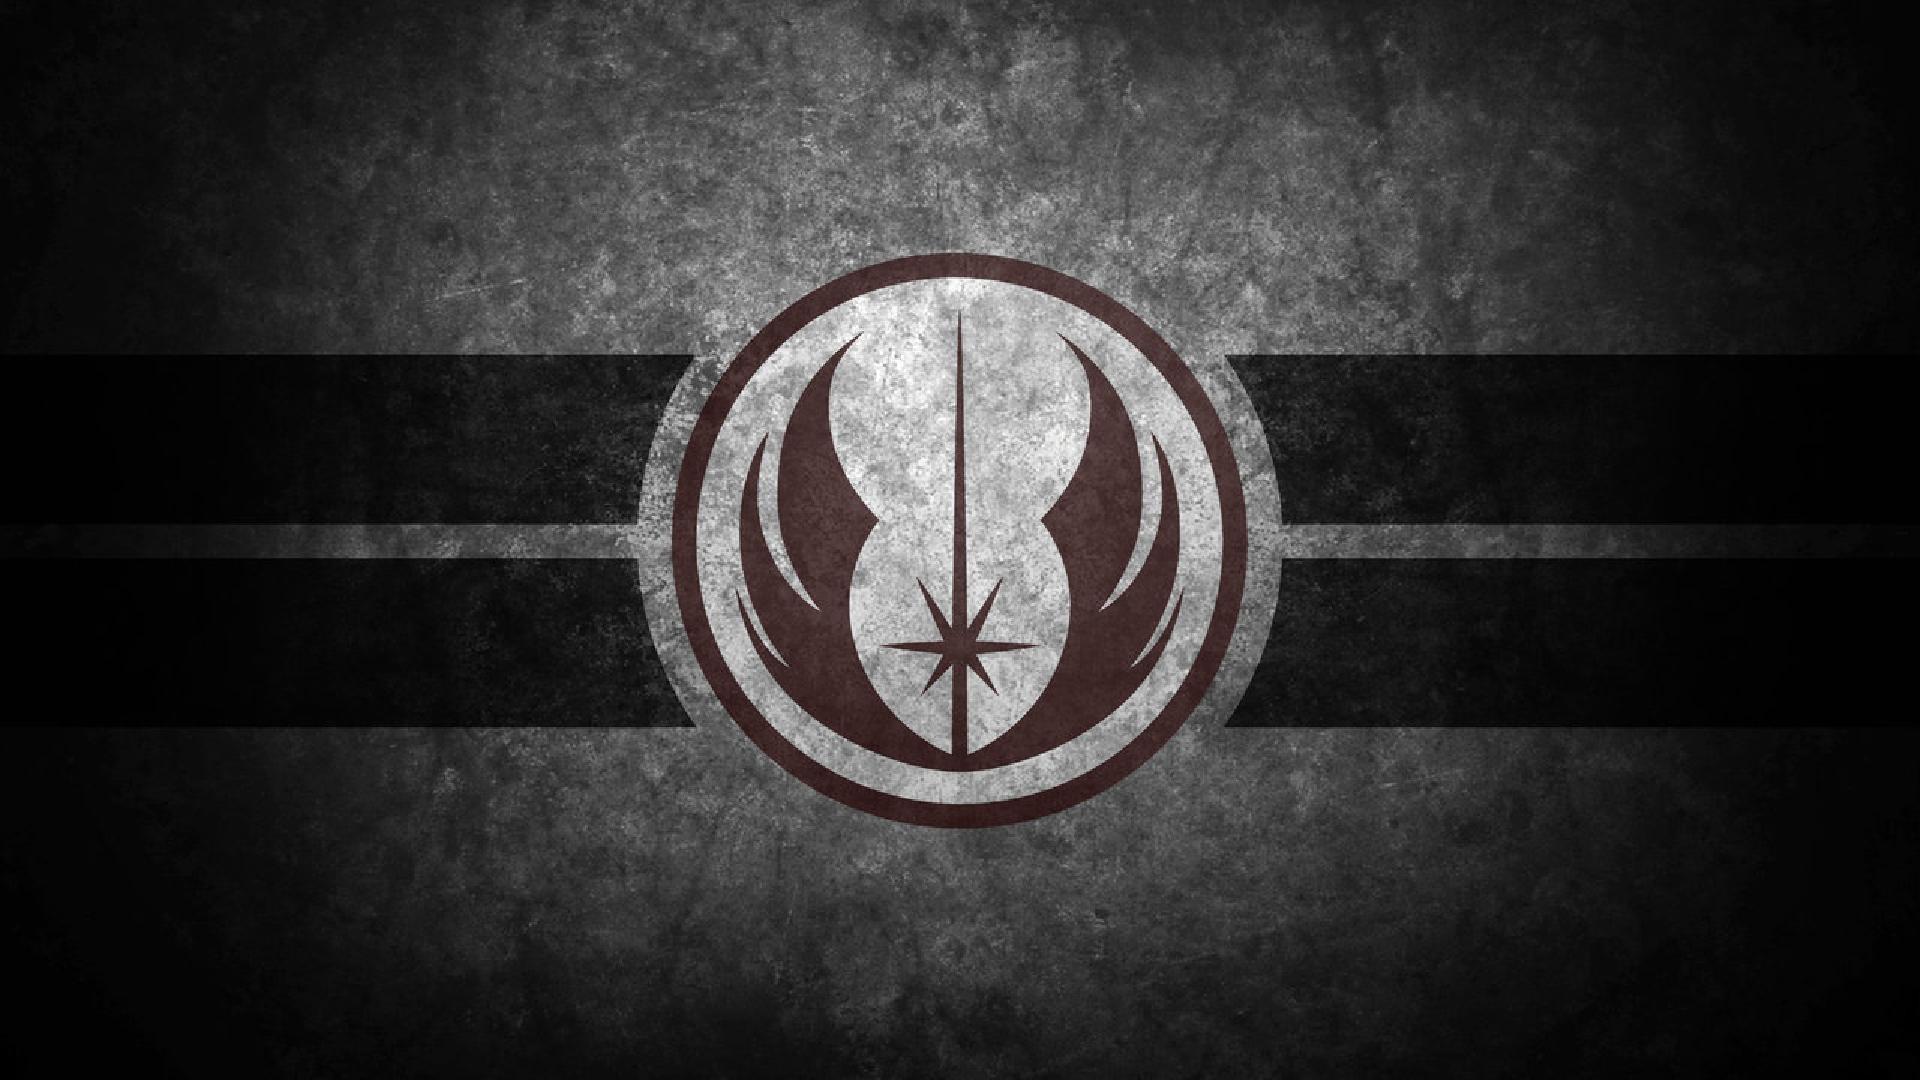 Res: 1920x1080, Jedi Order Wallpaper, (-275.58 Kb)